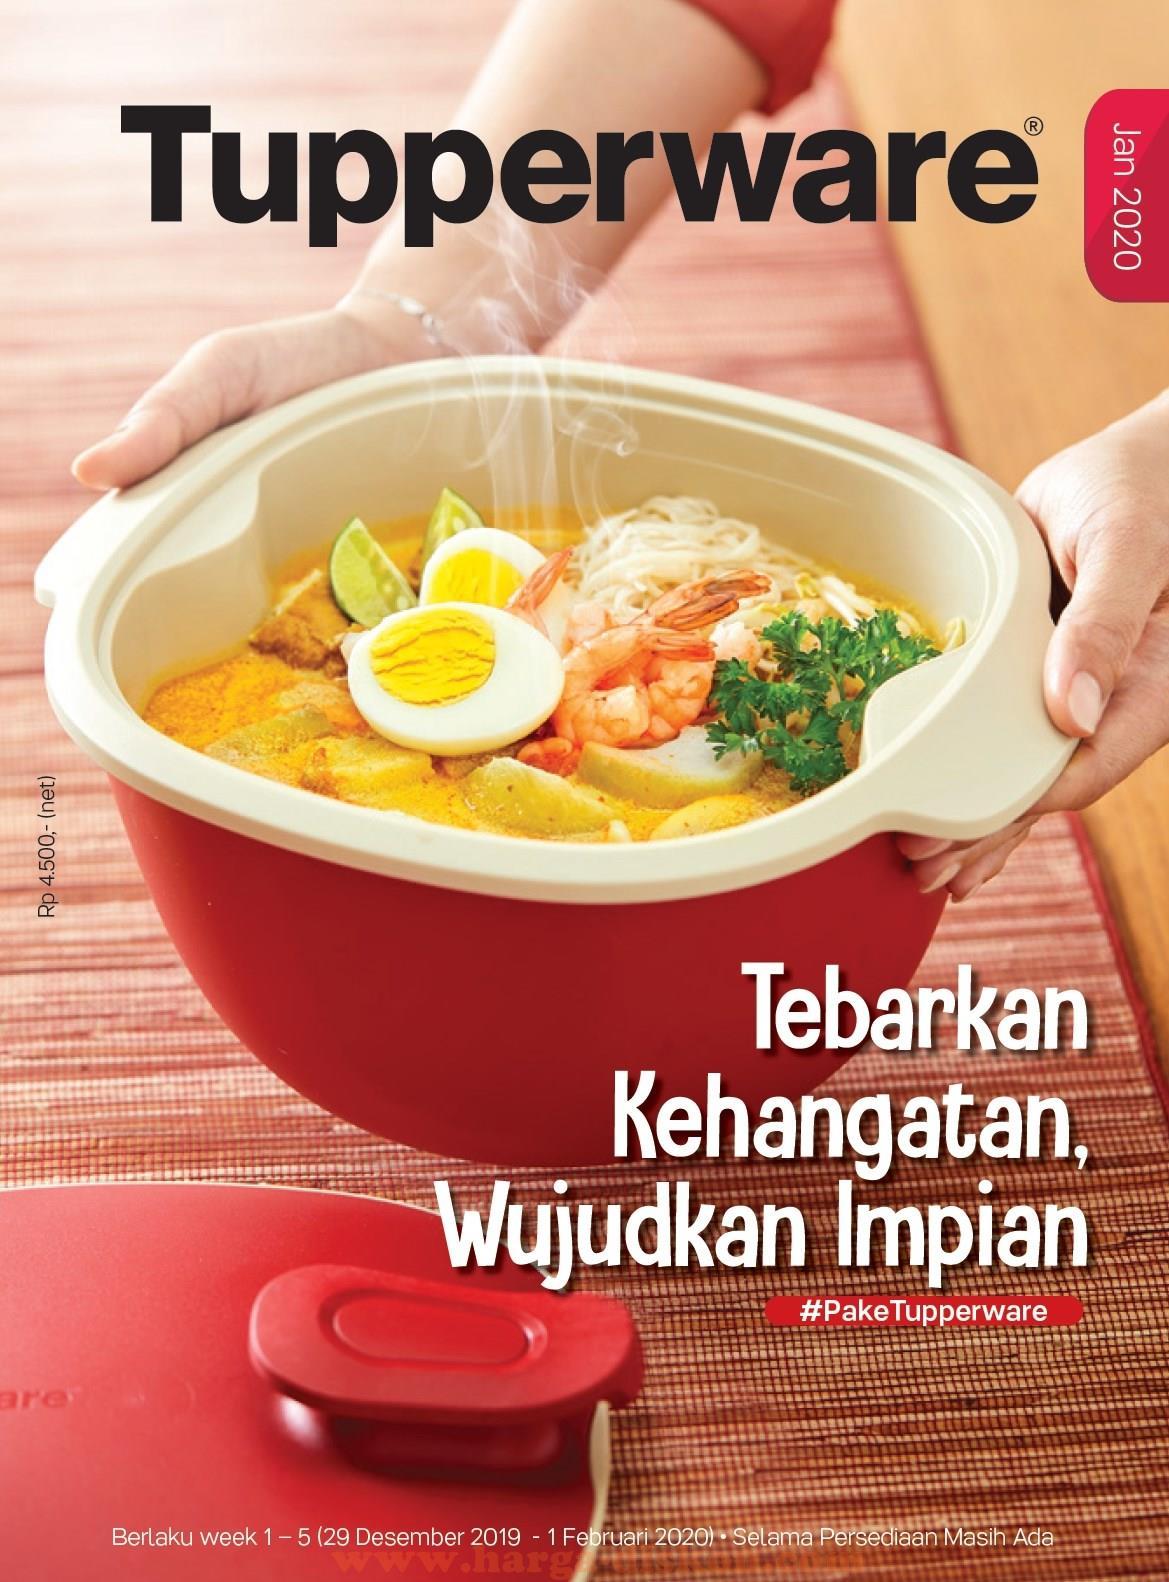 Katalog Tupperware Promo Tupperware Januari 2020 | Harga Diskon inside Tupperware Jan 2020